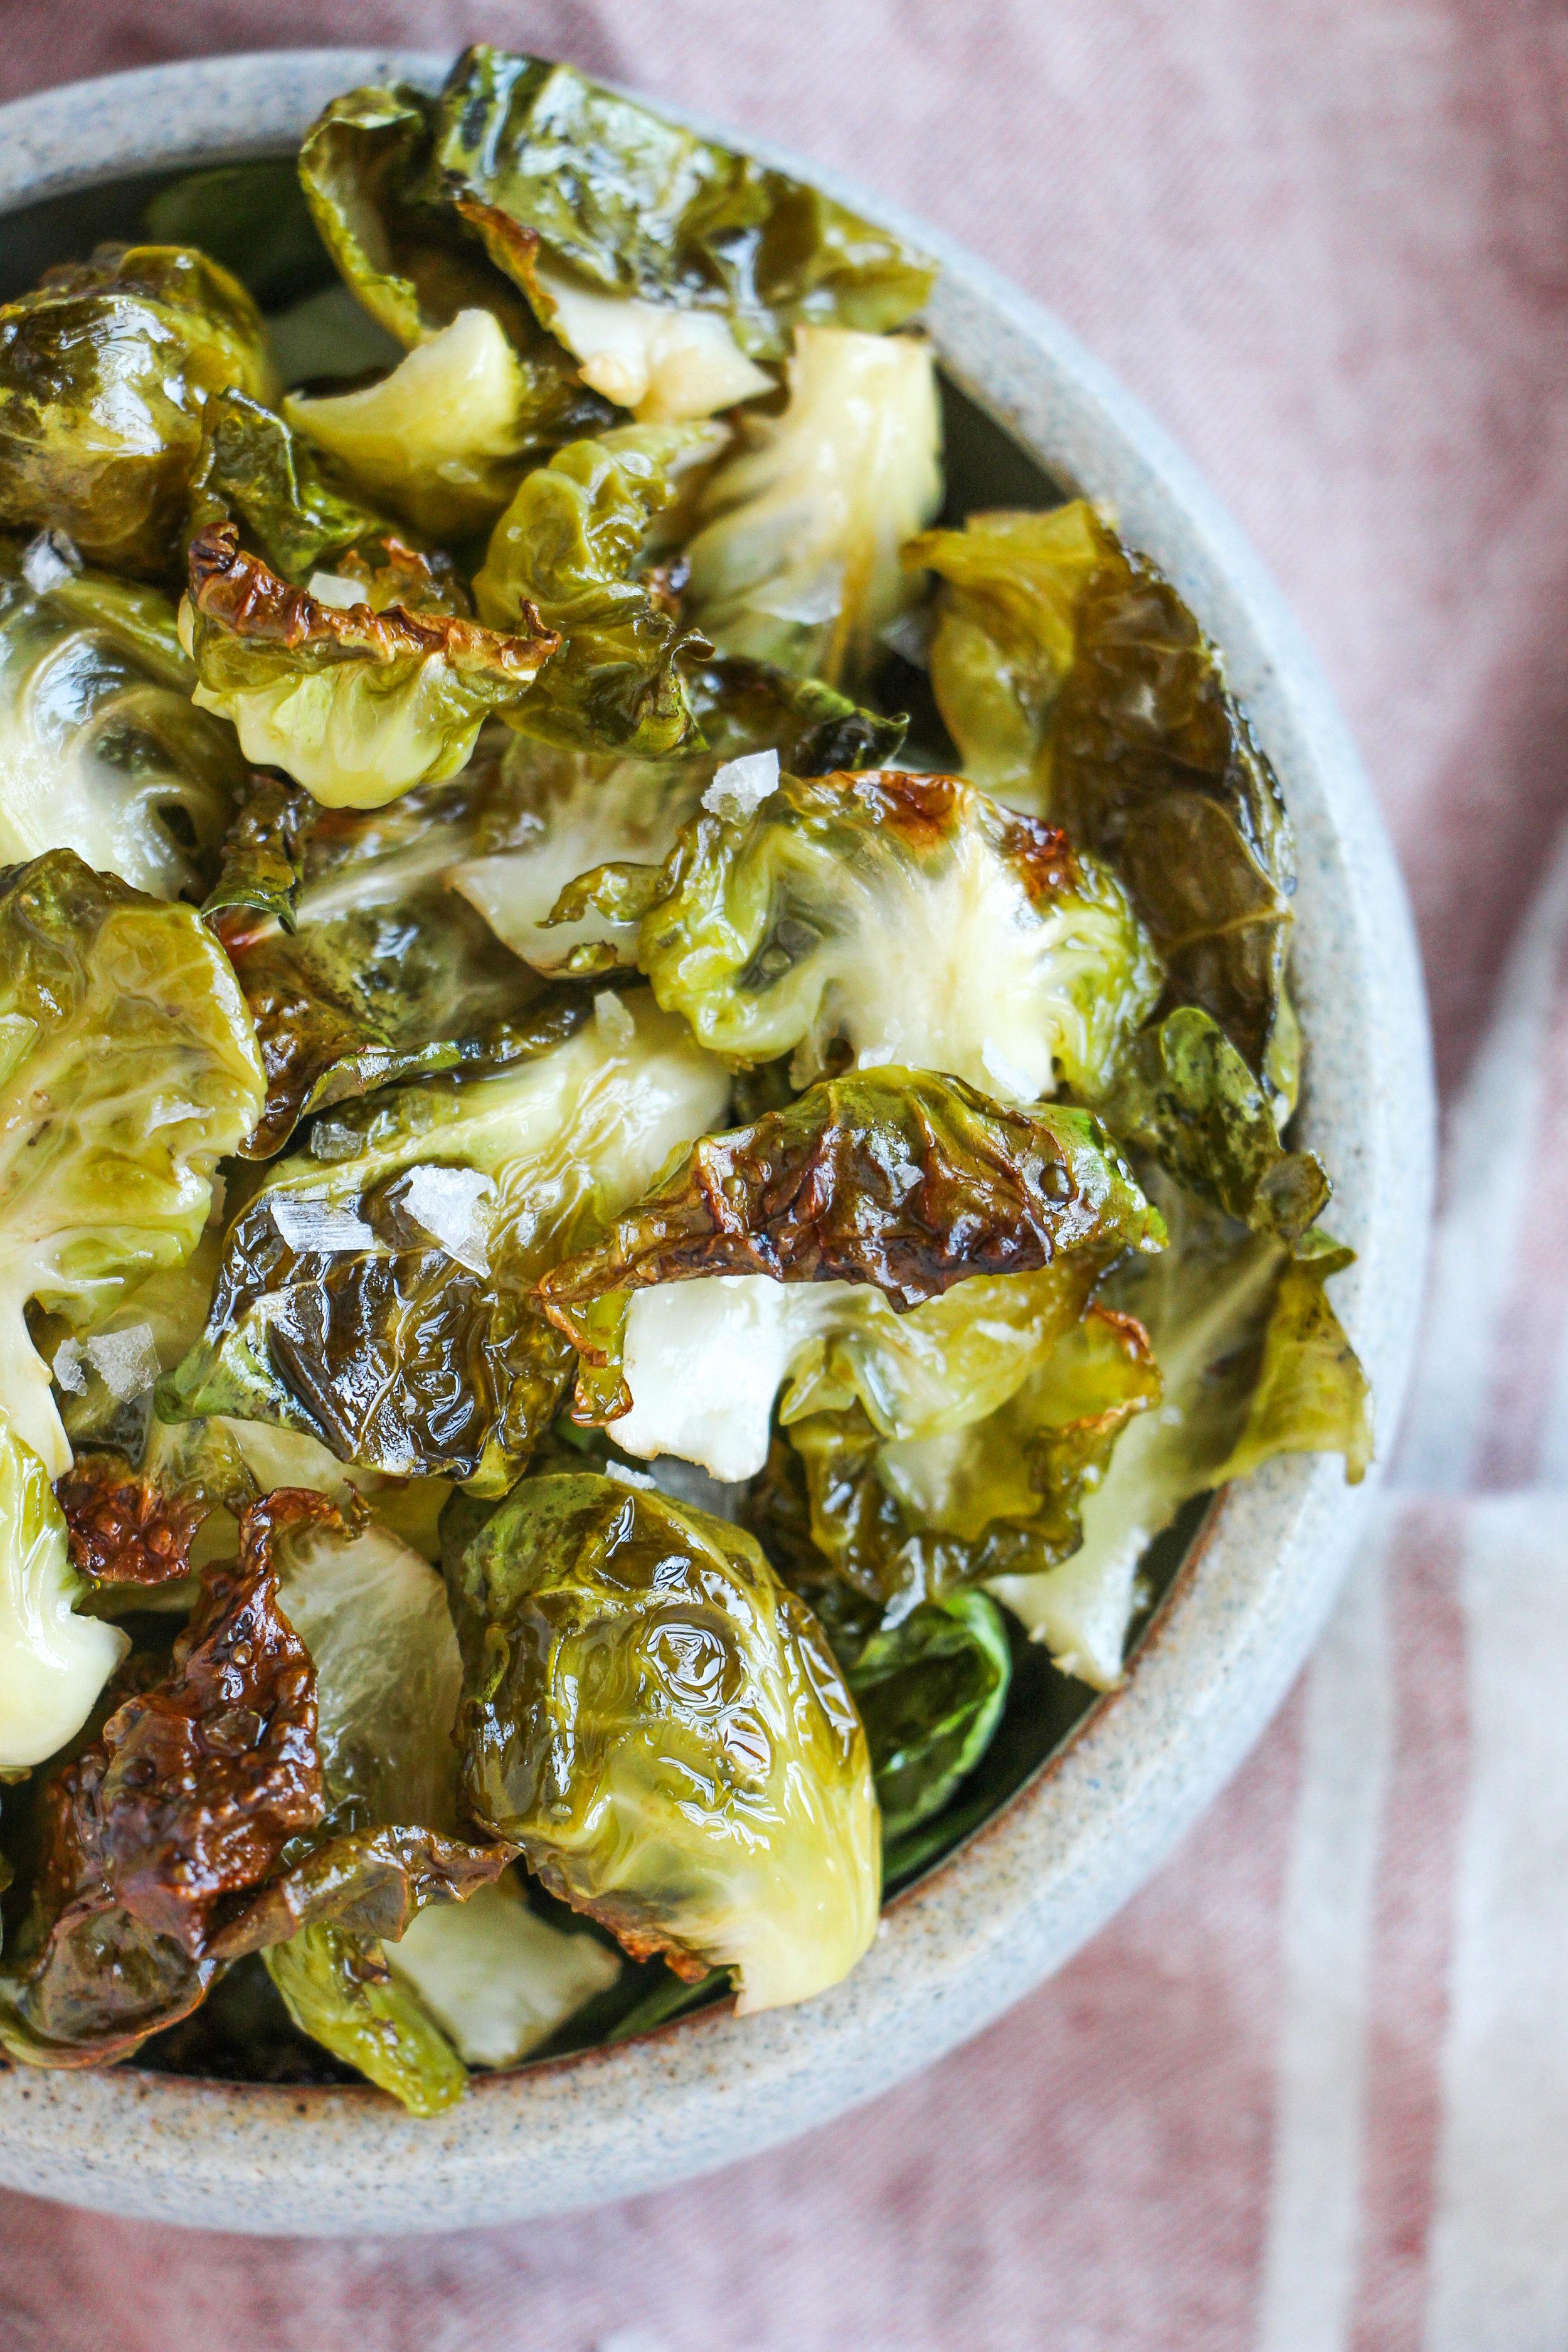 salt-and-vinegar-brussels-sprouts-chips-ShiraRD-paleo-refinedsugarfree-SnacksbyShira.jpg